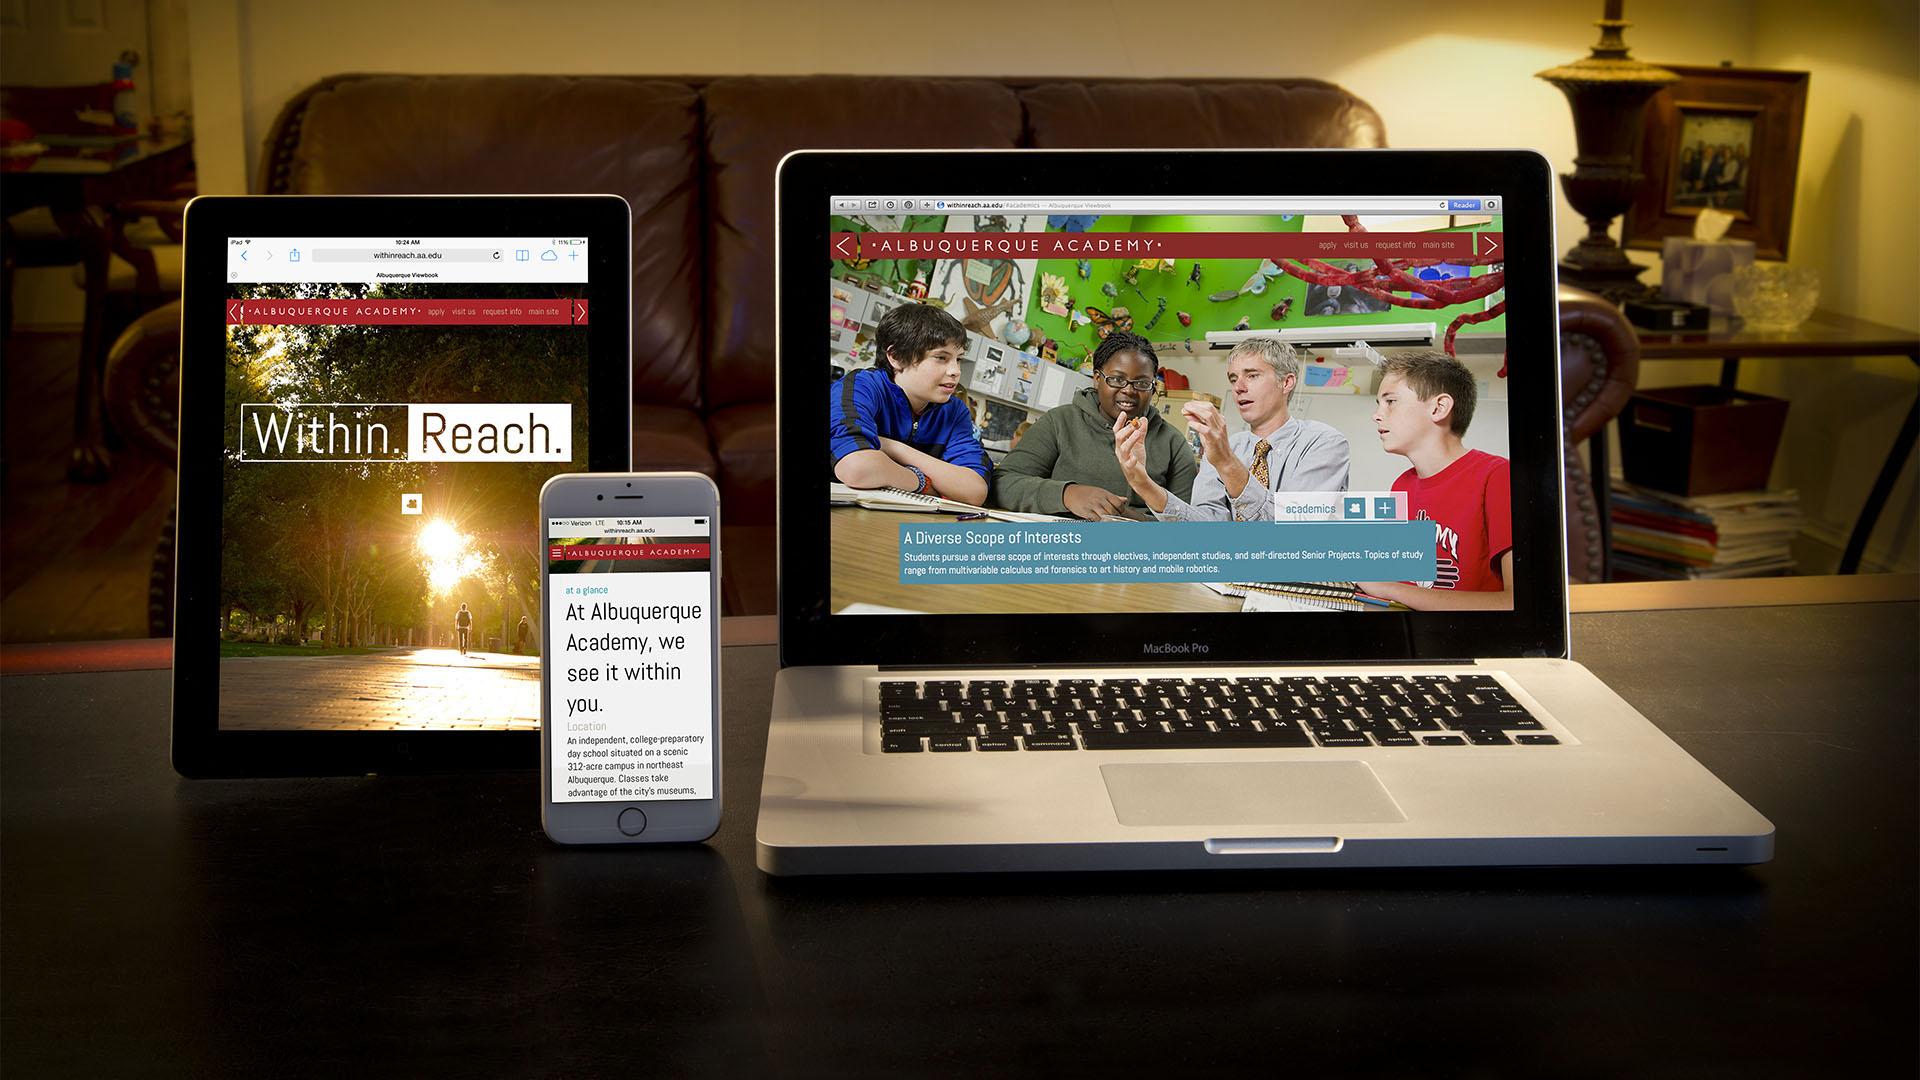 Albuquerque-Academy-Branding-Marketing-Admissions-Campaign-Interactive-Viewbook-1.jpg